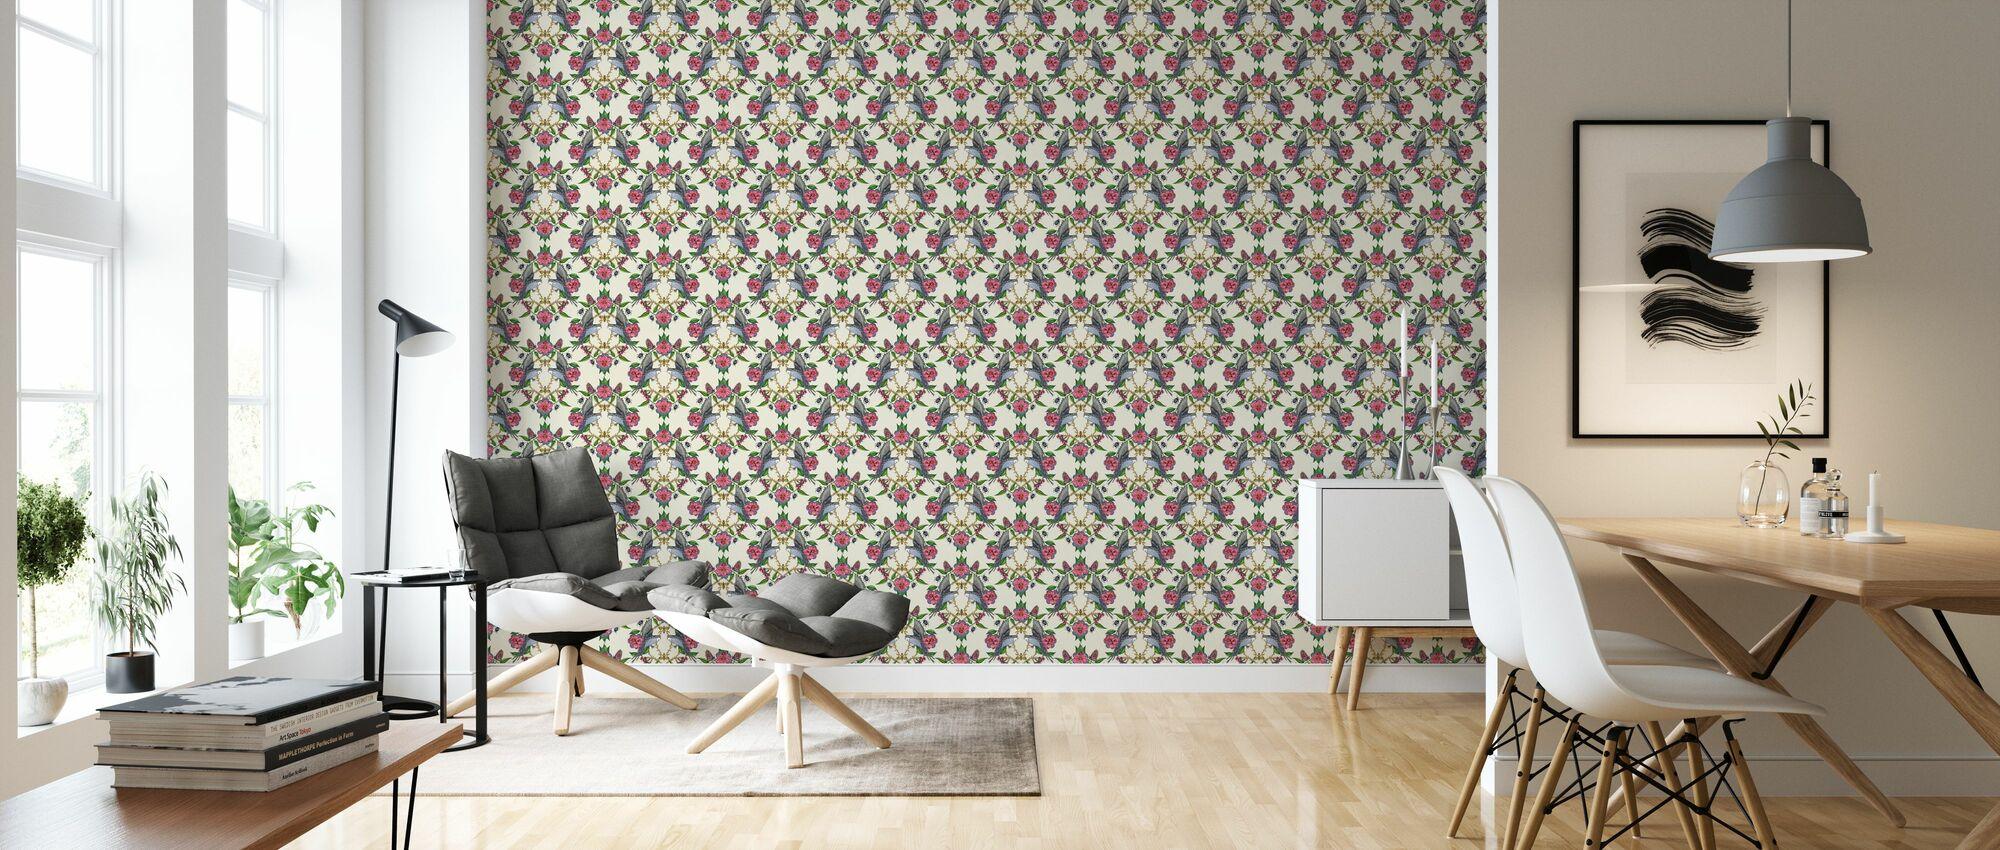 Budgies Medallion Offwhite - Wallpaper - Living Room